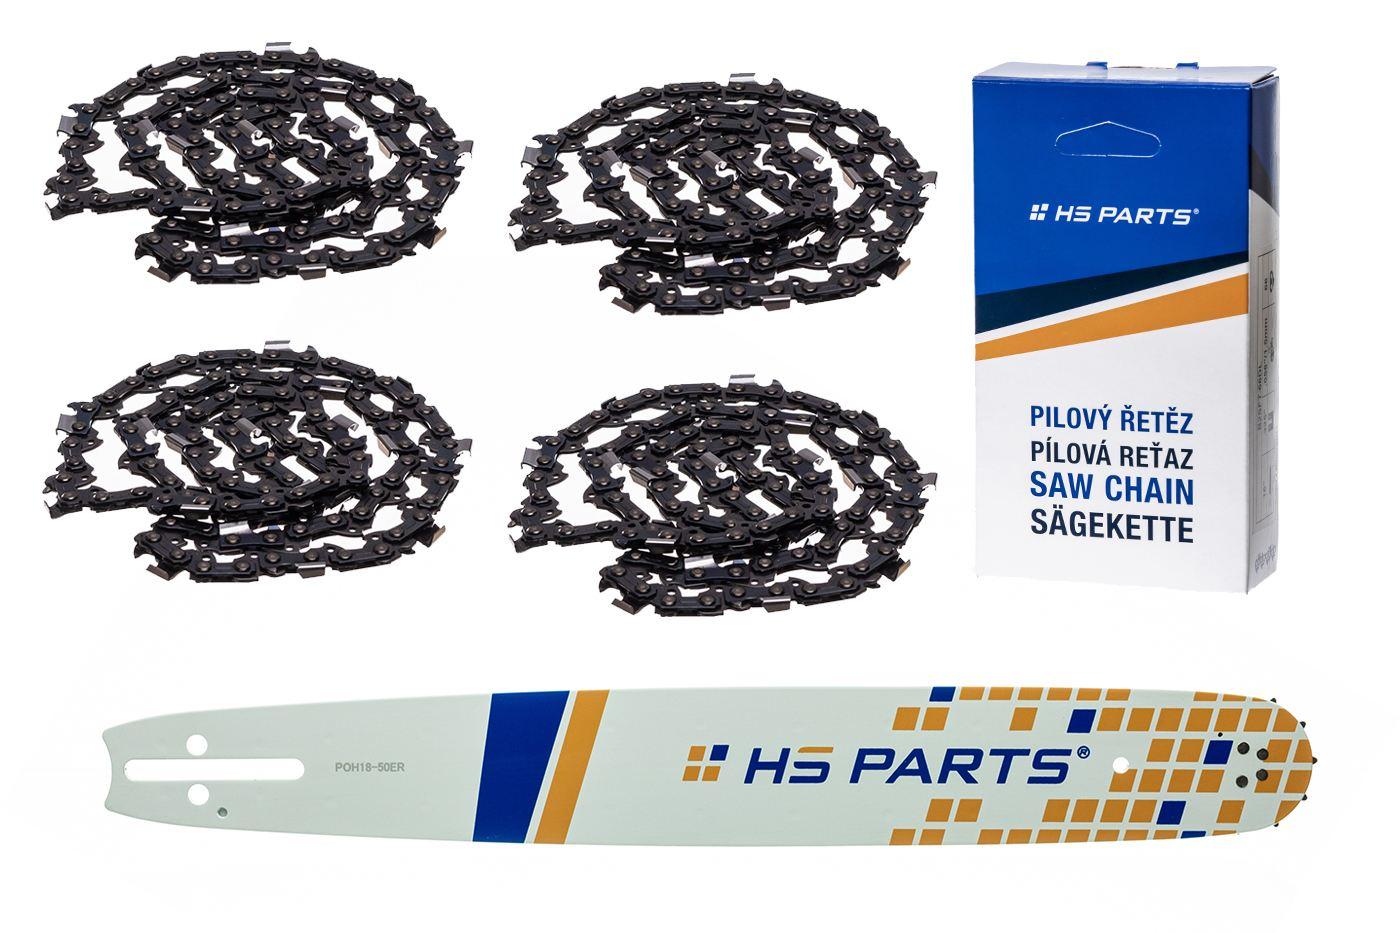 "HS PARTS Akciový set vodiaca líšta 18"" (45 cm) 3/8"" .050"" (1,3 mm) + 4x pílový reťaz 64čl."